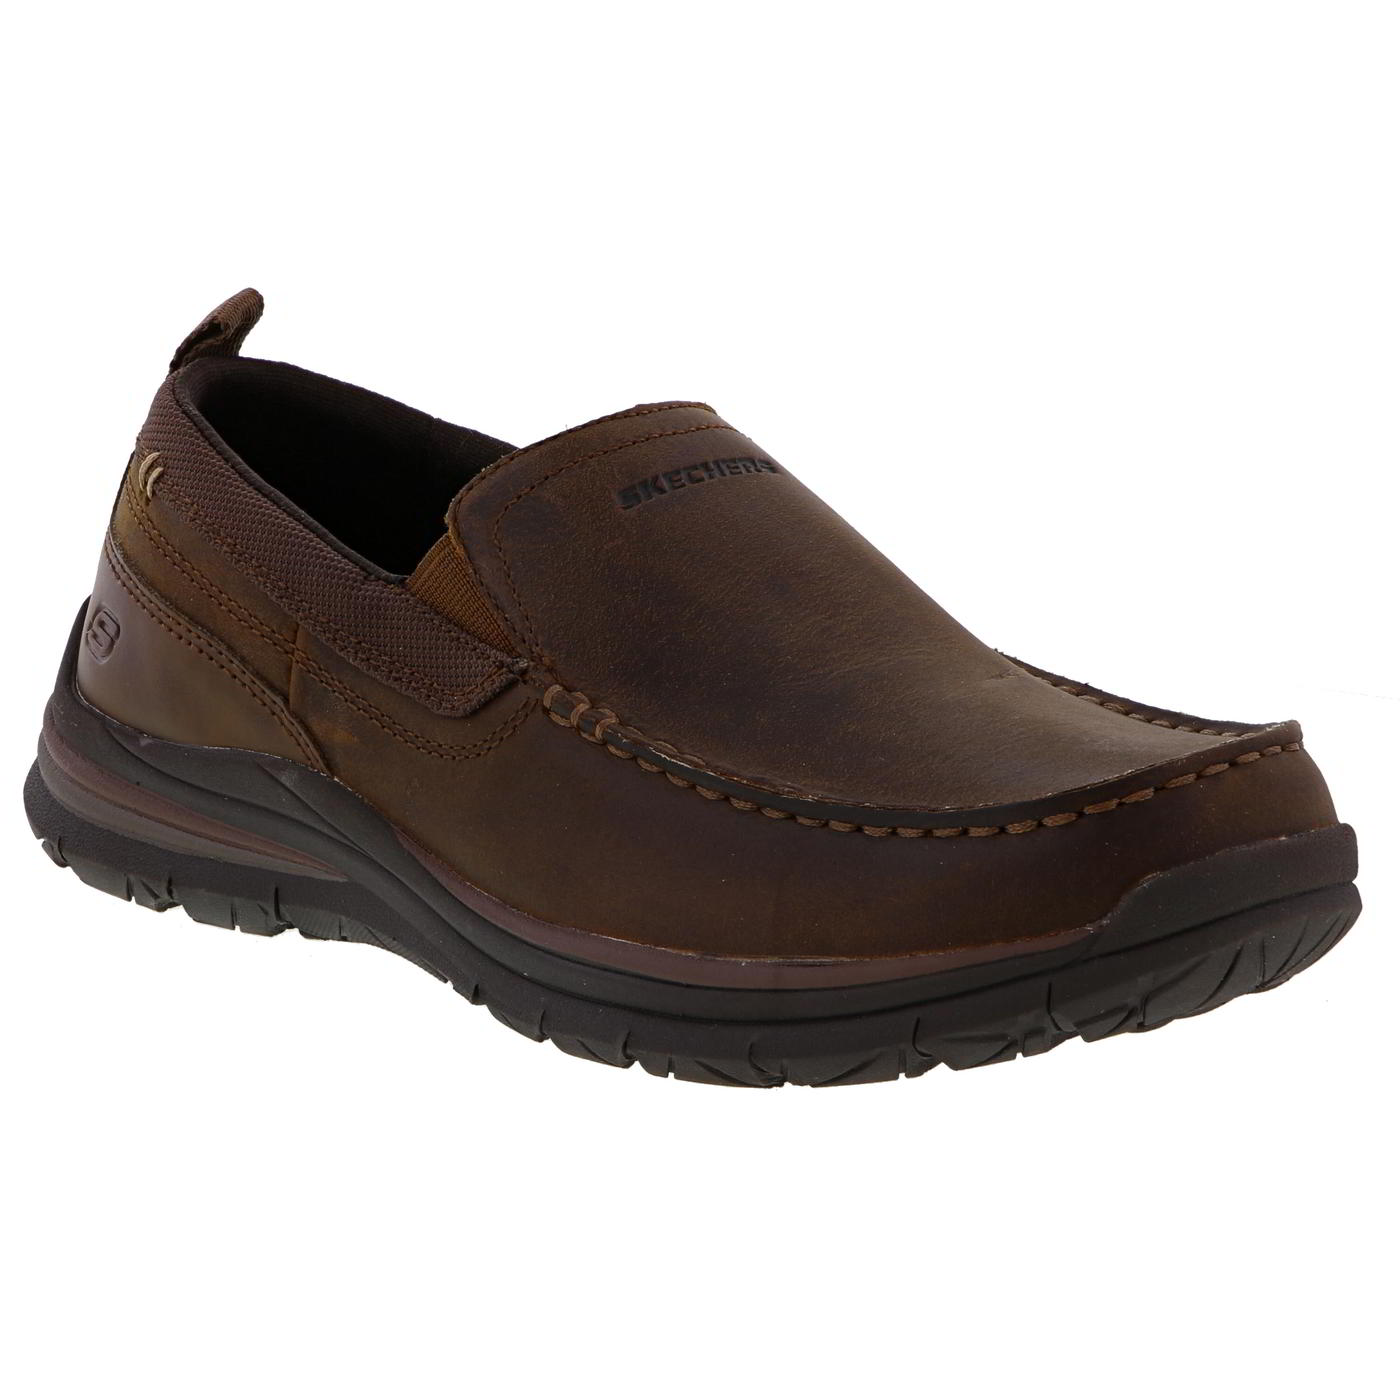 Skechers Mens Superior 2.0 Jeveno Slip On Shoes - Dark Brown